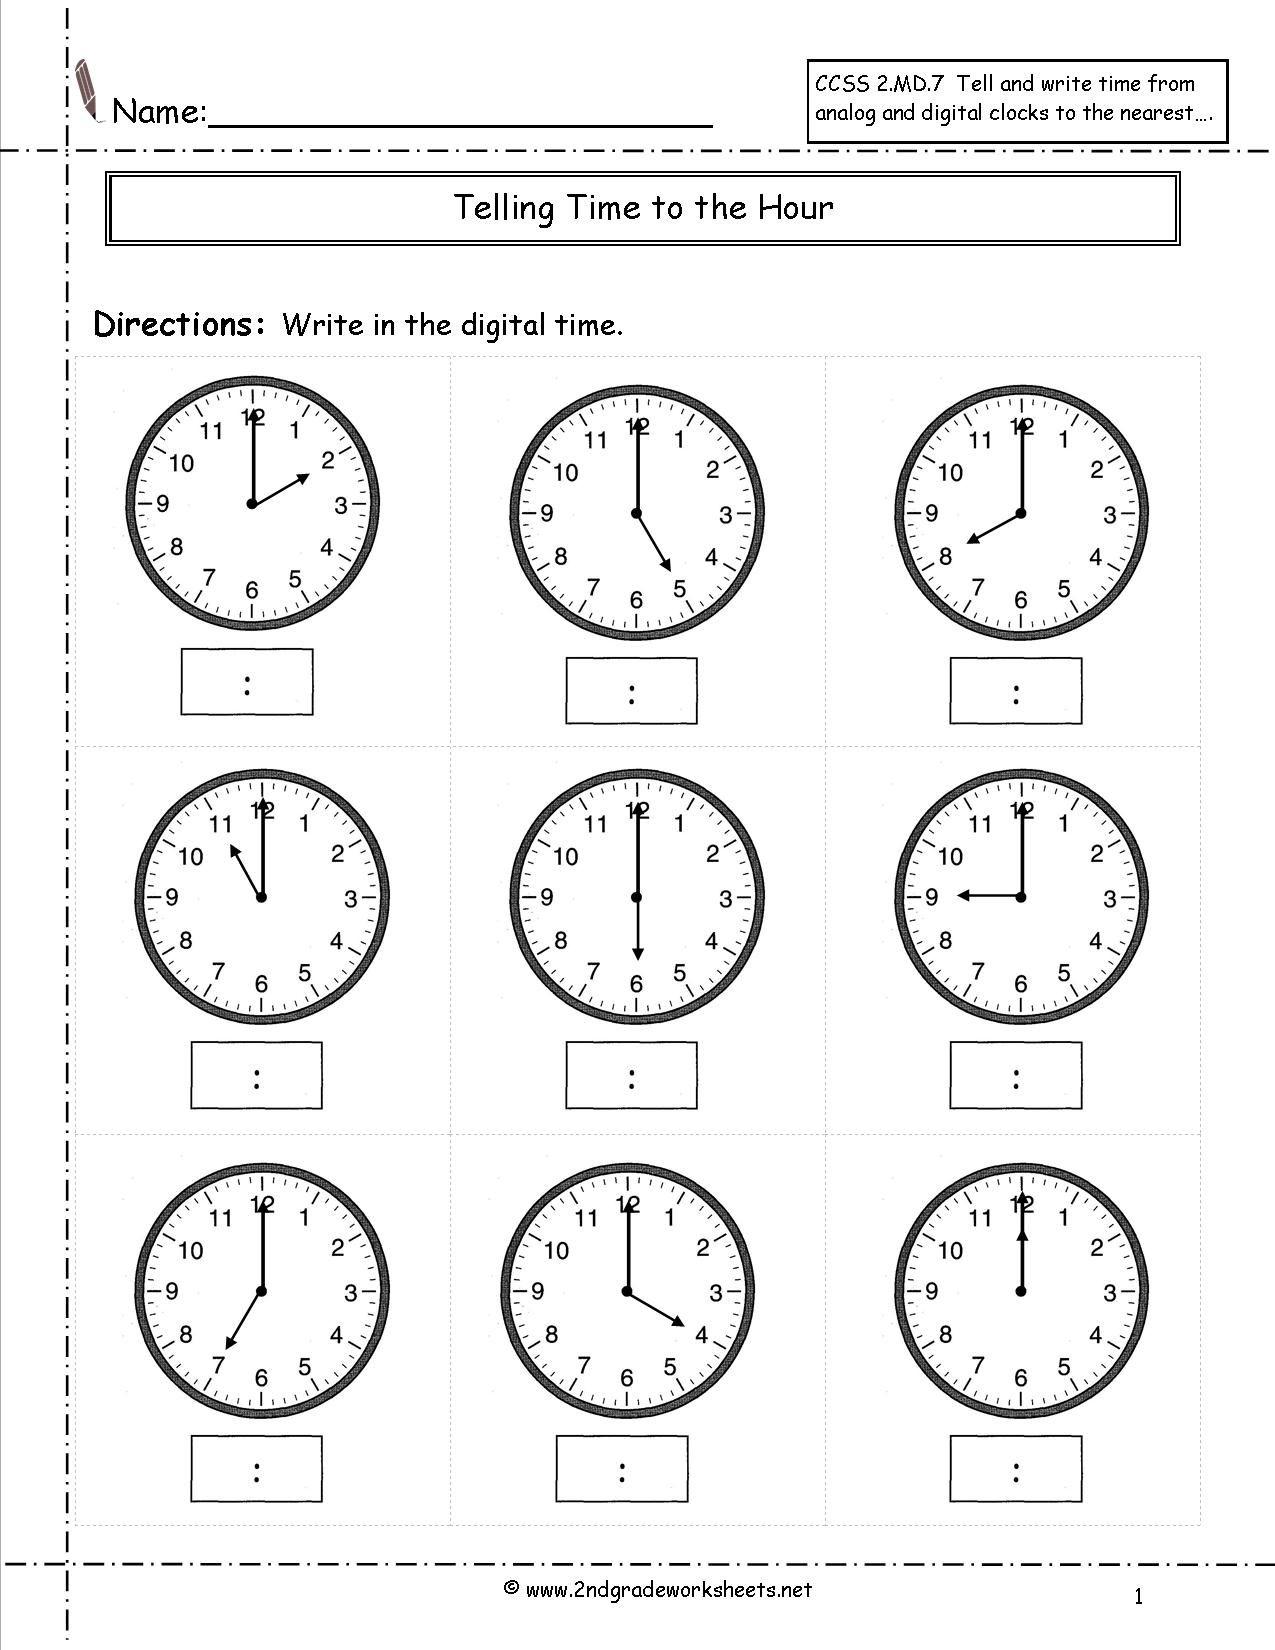 Telling Time Worksheets Half Hour | זמן | Clock Worksheets | Printable Telling Time Worksheets 1St Grade